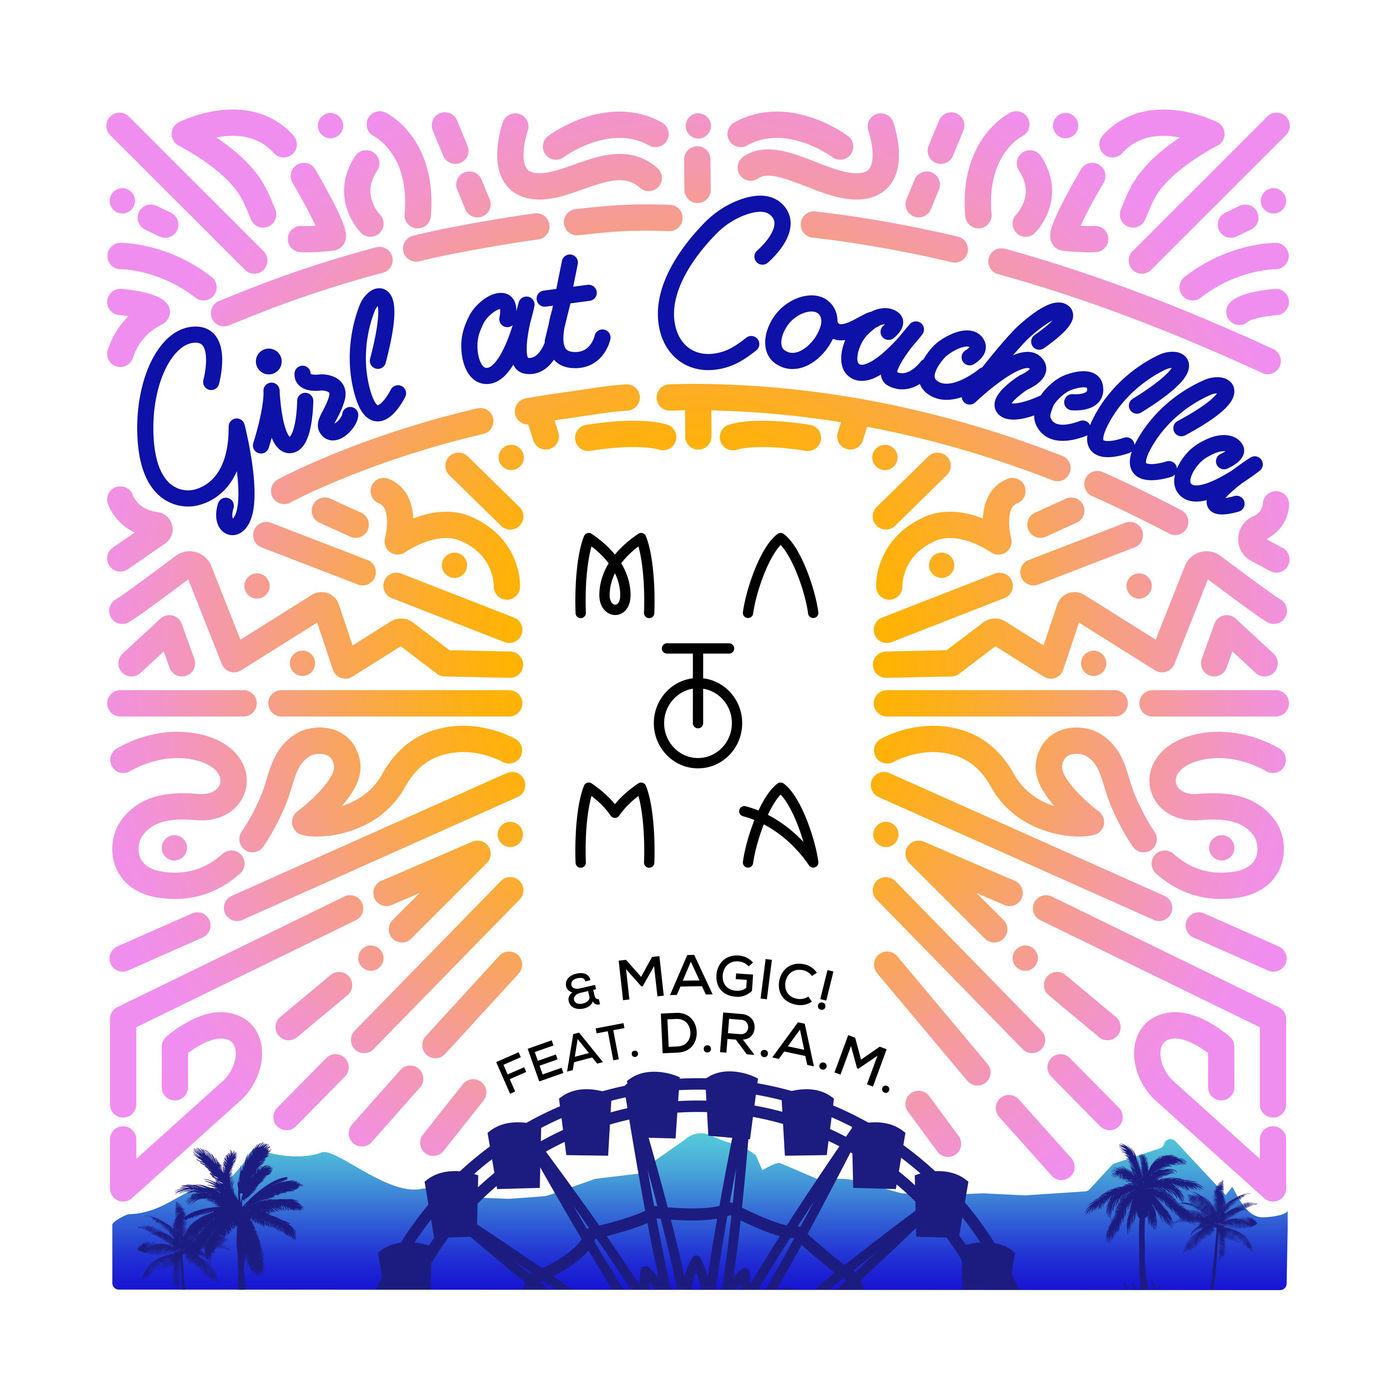 Matoma & MAGIC! - Girl at Coachella (feat. D.R.A.M.) - Single Cover